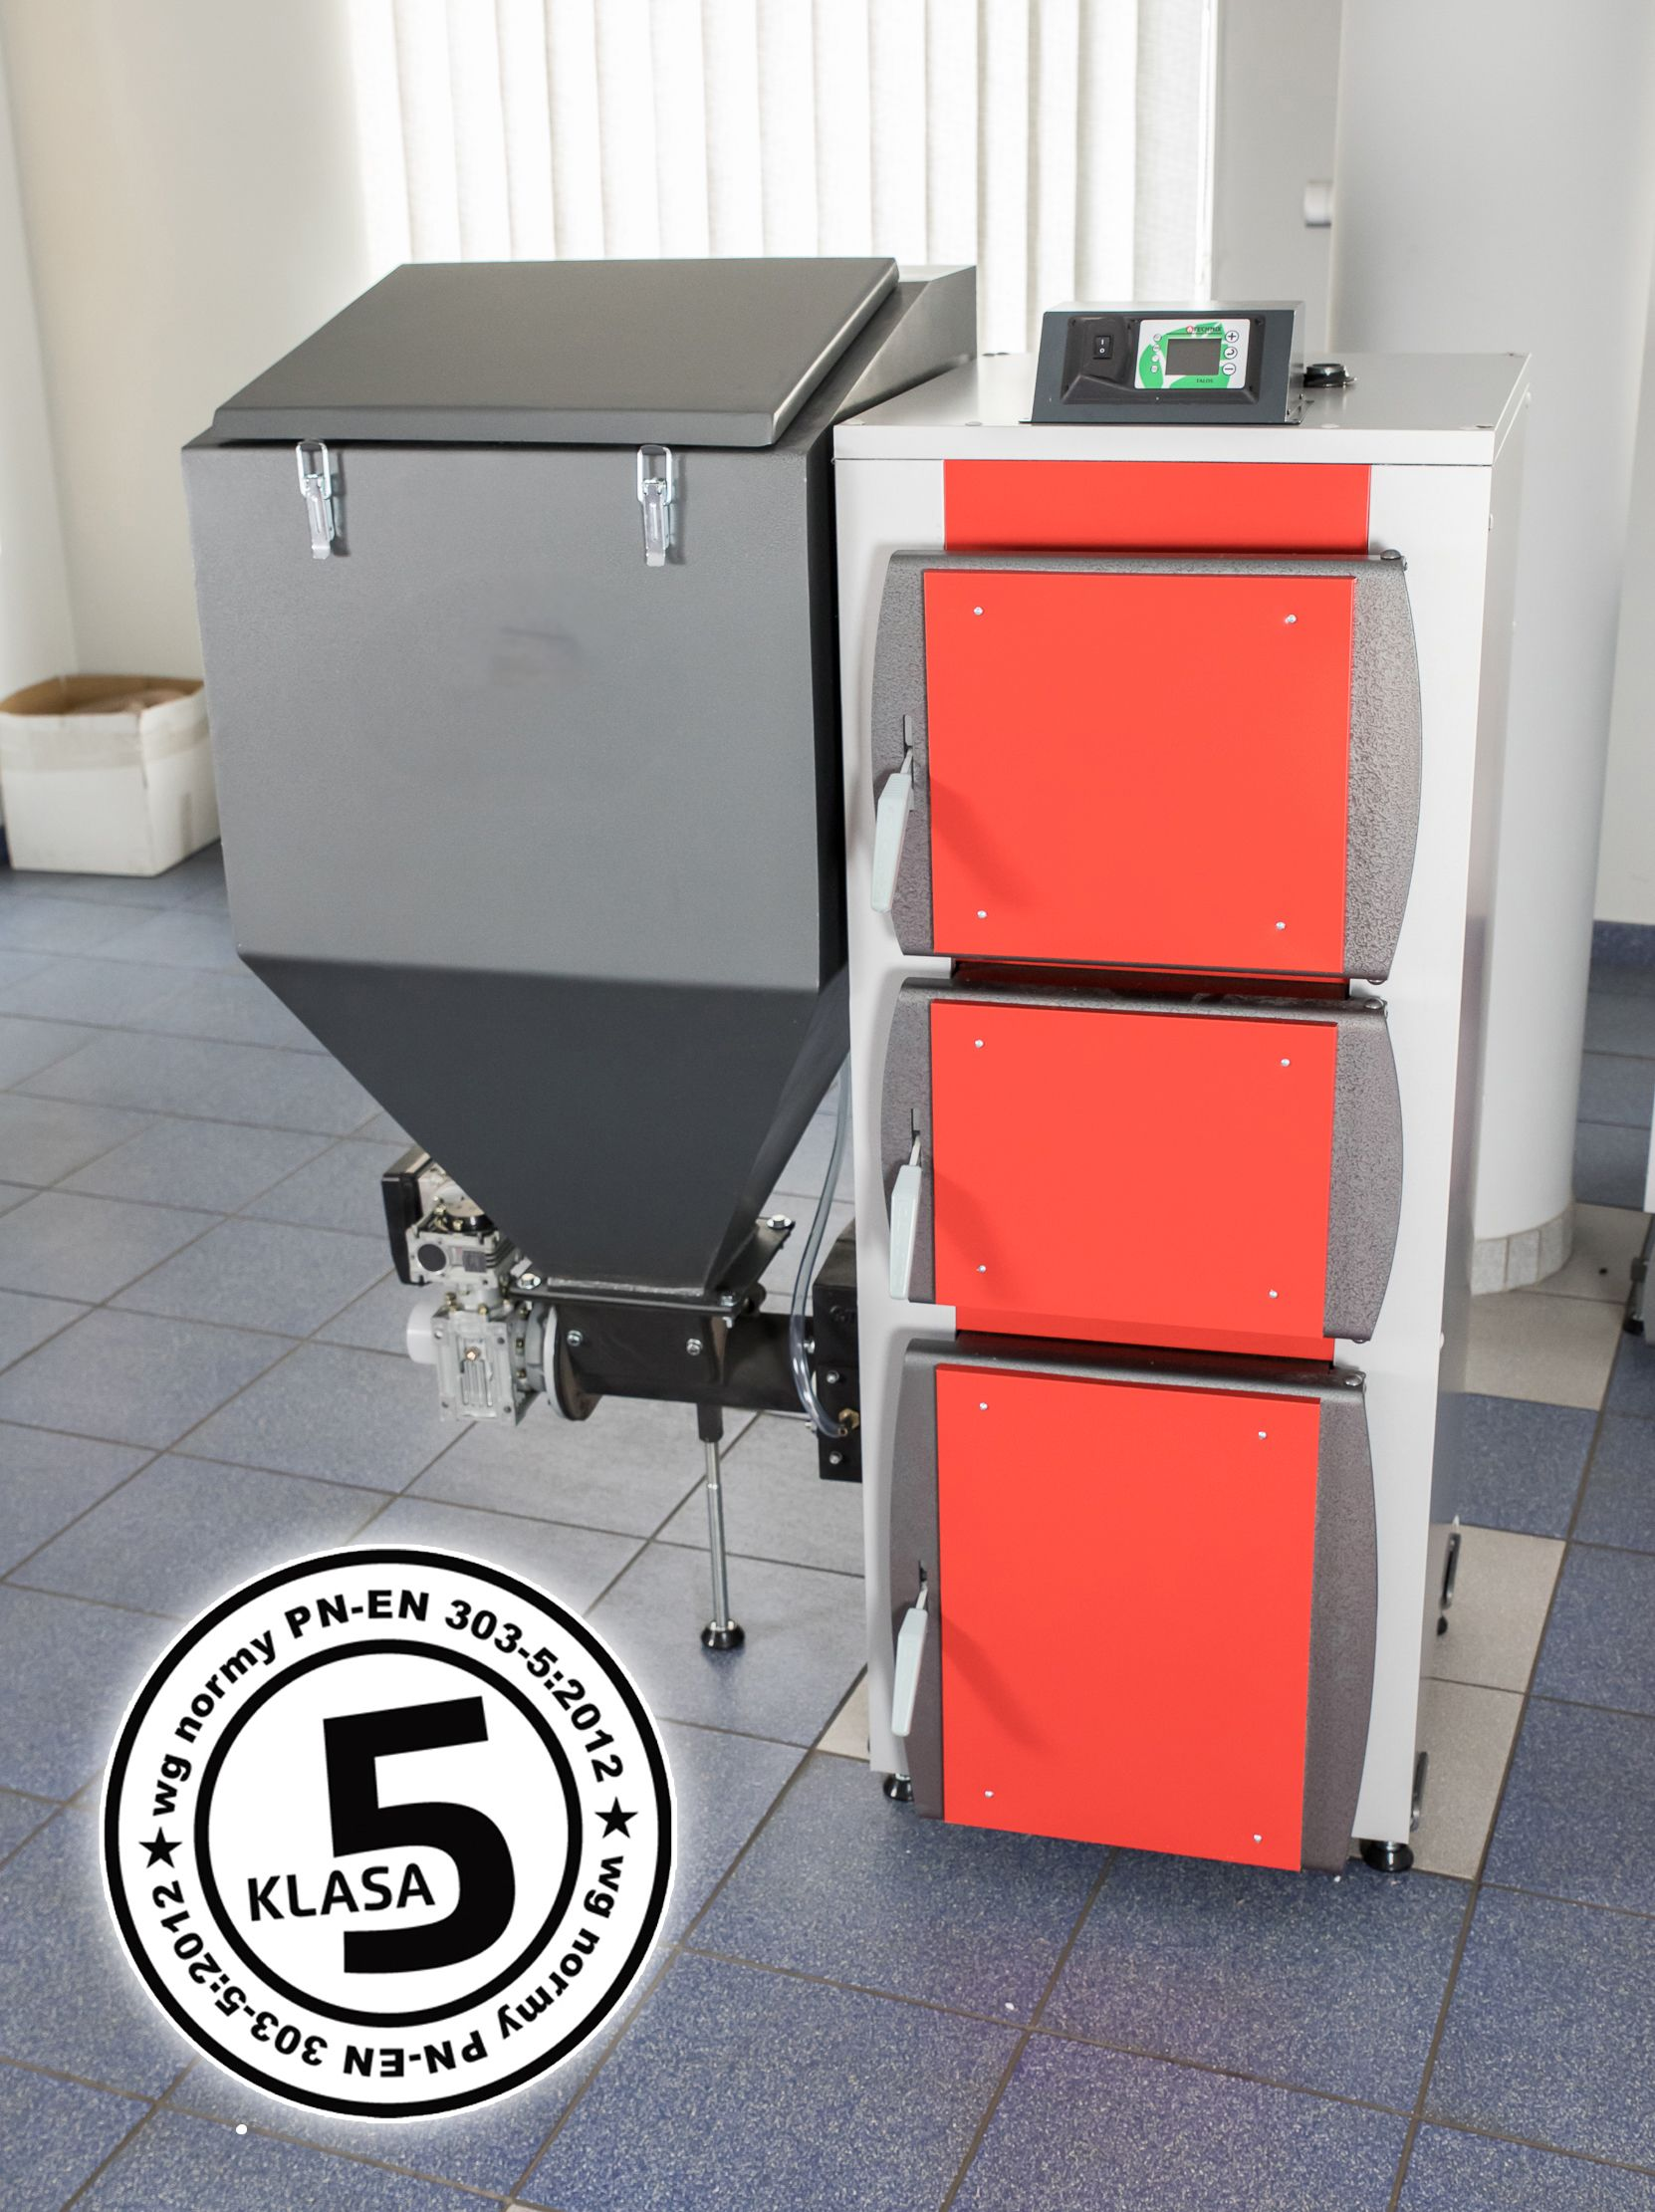 Piec Kociol Slimak Podajnik 9kw 5 Klasa Ecodesign Filing Cabinet Storage Furniture